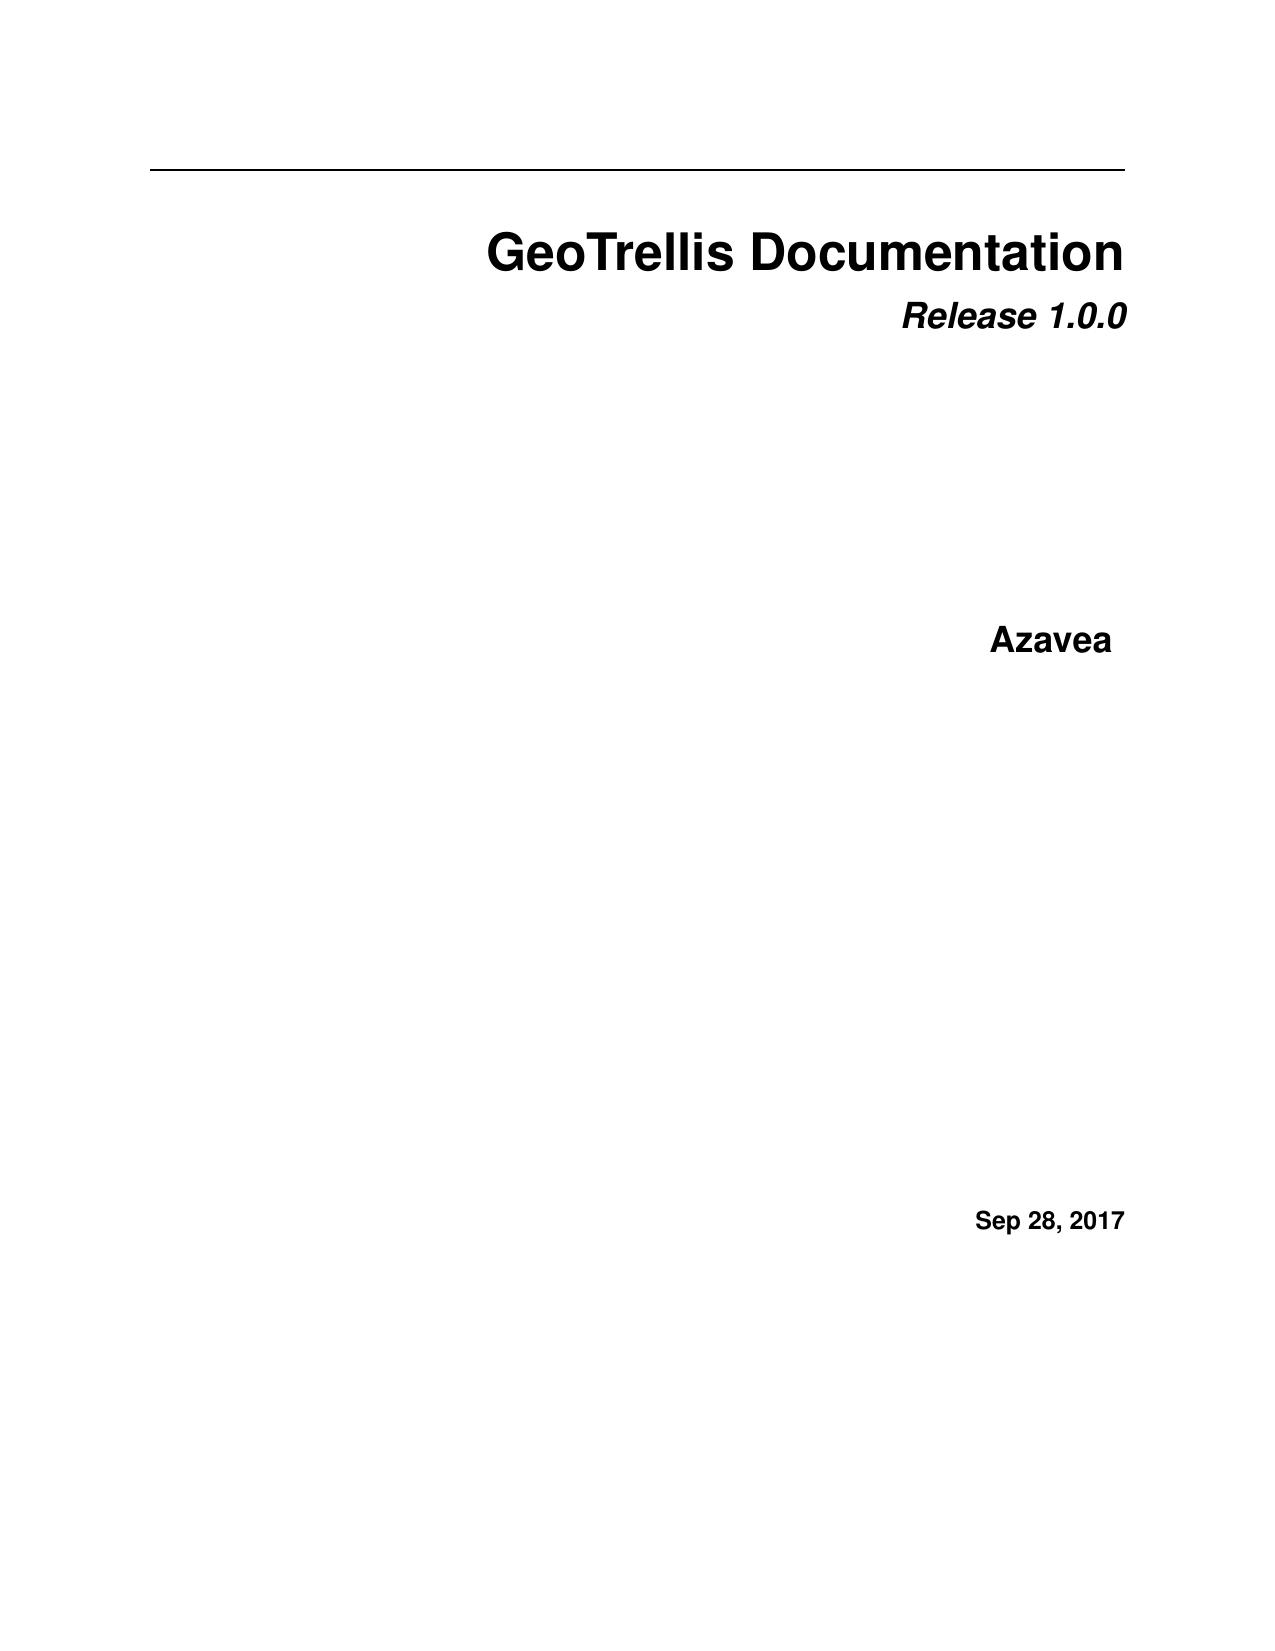 GeoTrellis Documentation | manualzz com